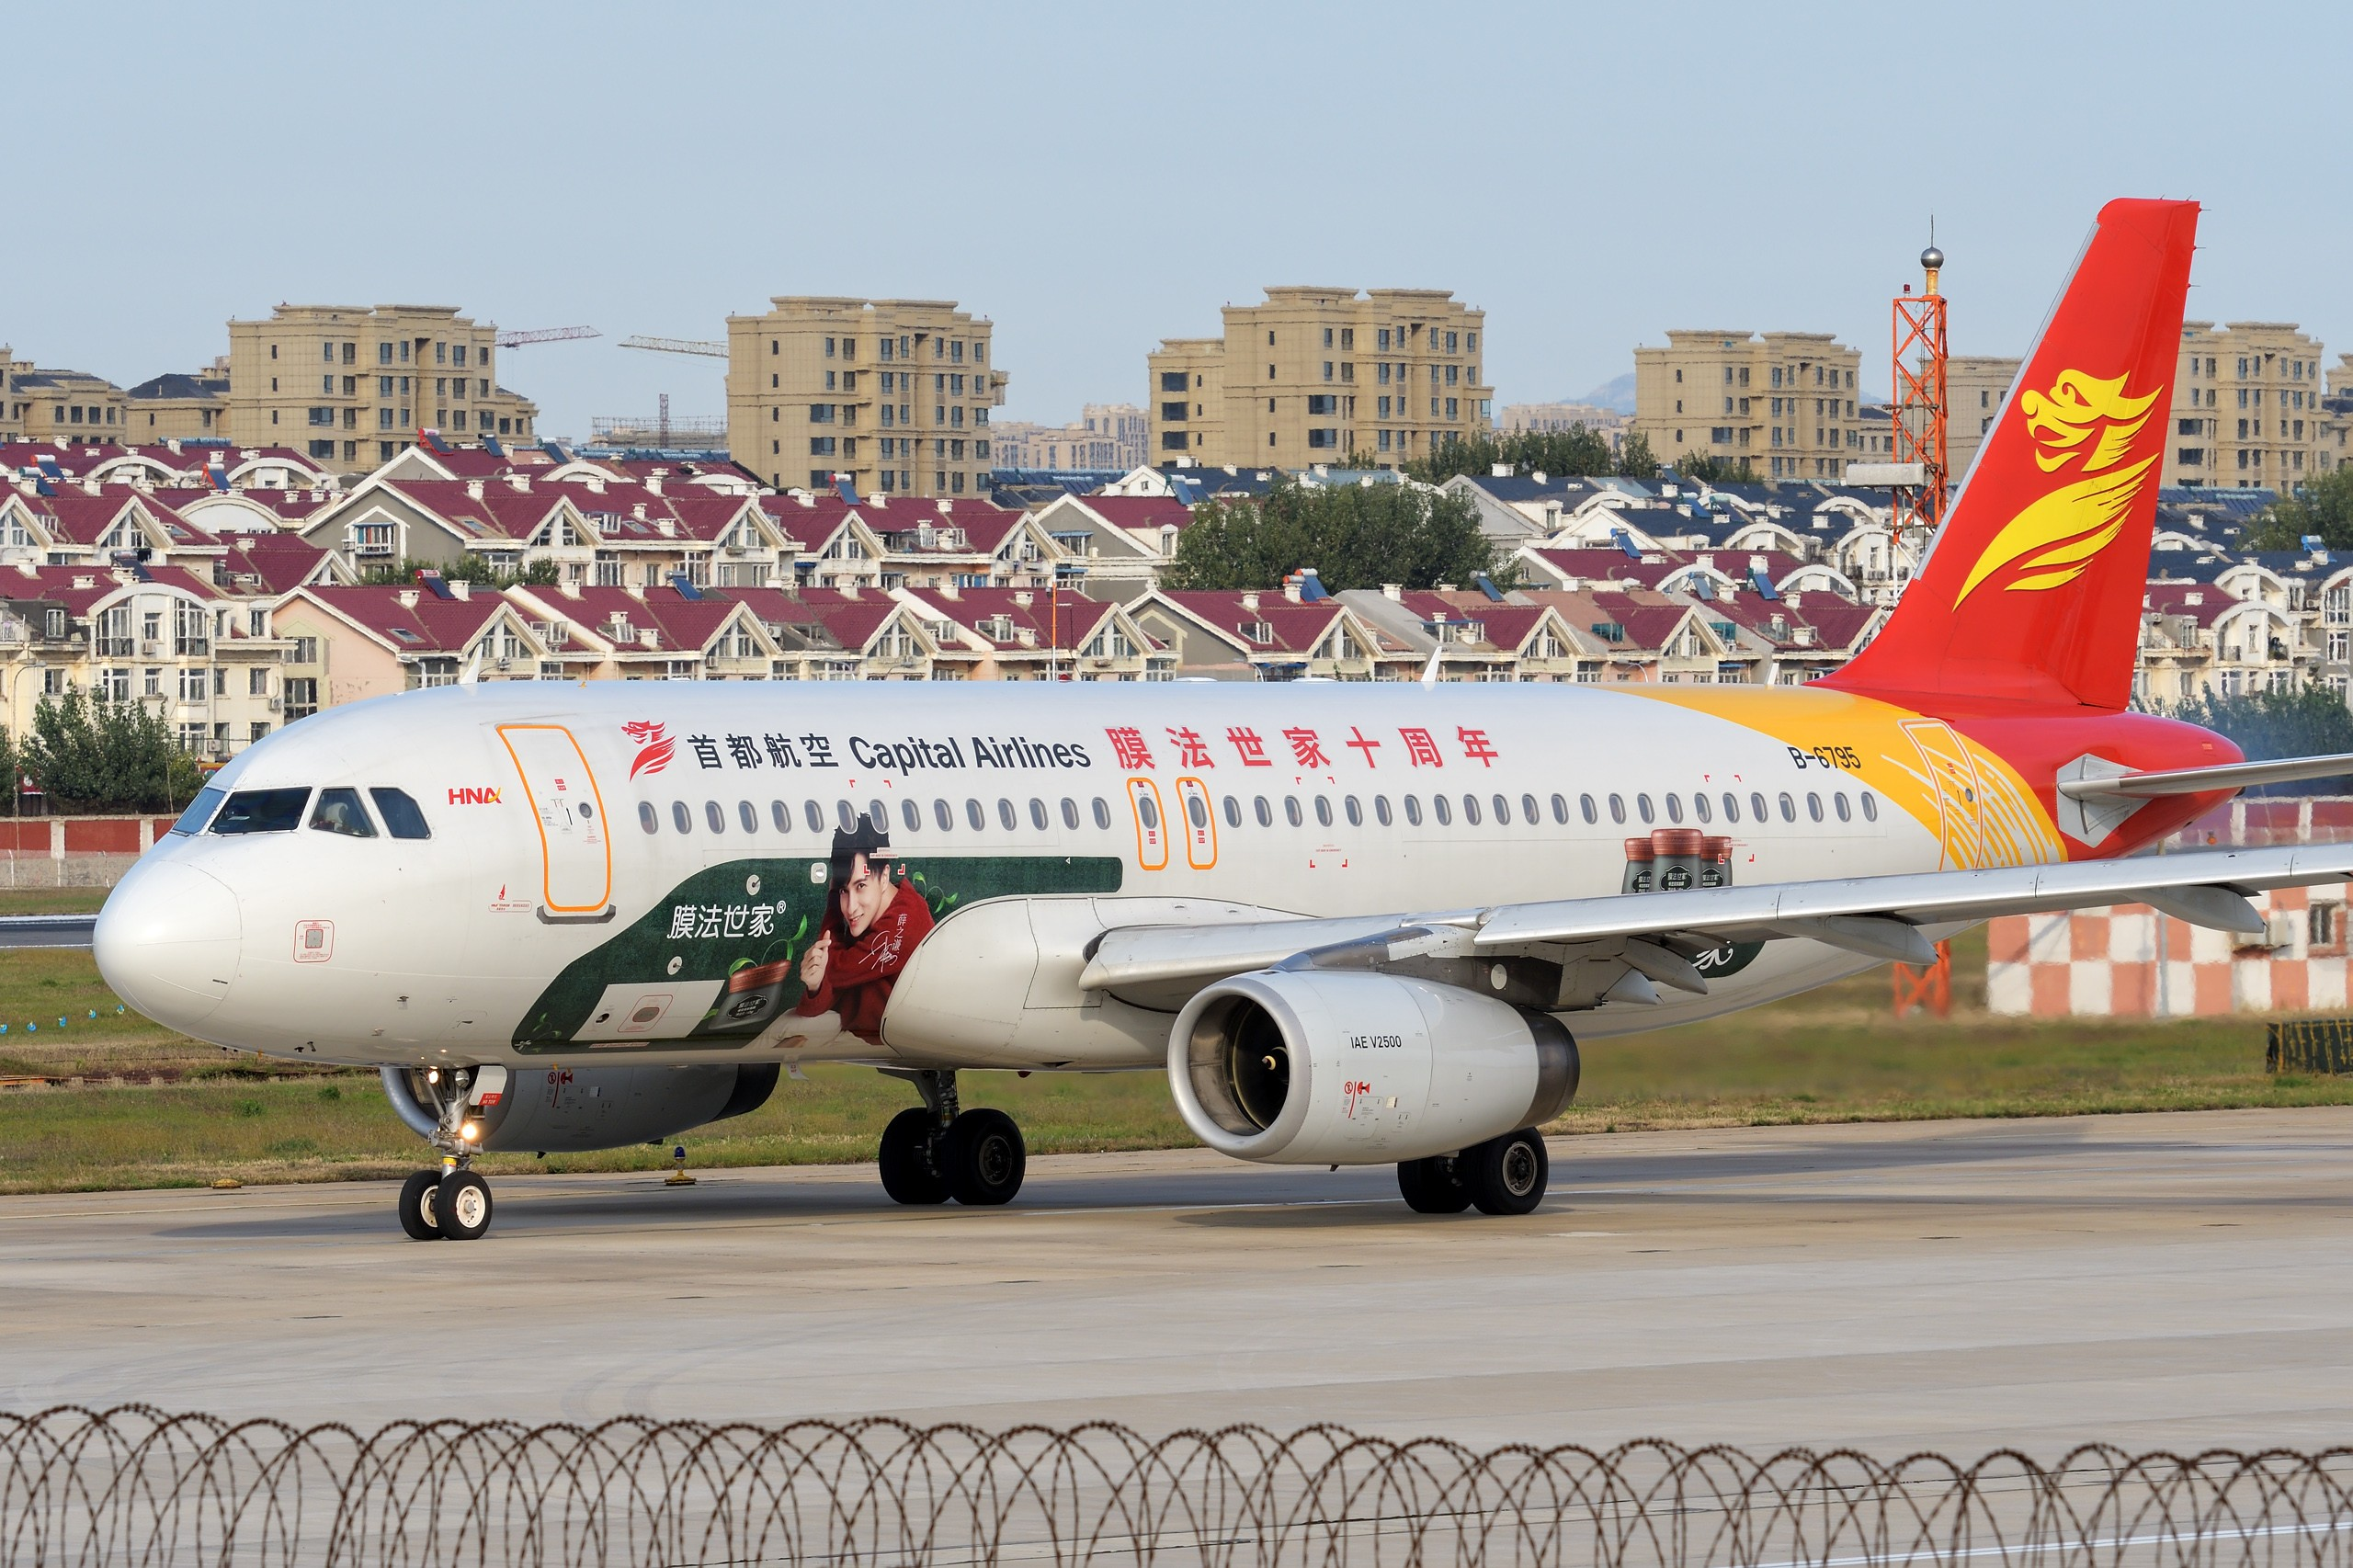 ★[DLC]膜法世家2560pix壁纸-A网的评价是......★ AIRBUS A320-200 B-6795 中国大连国际机场